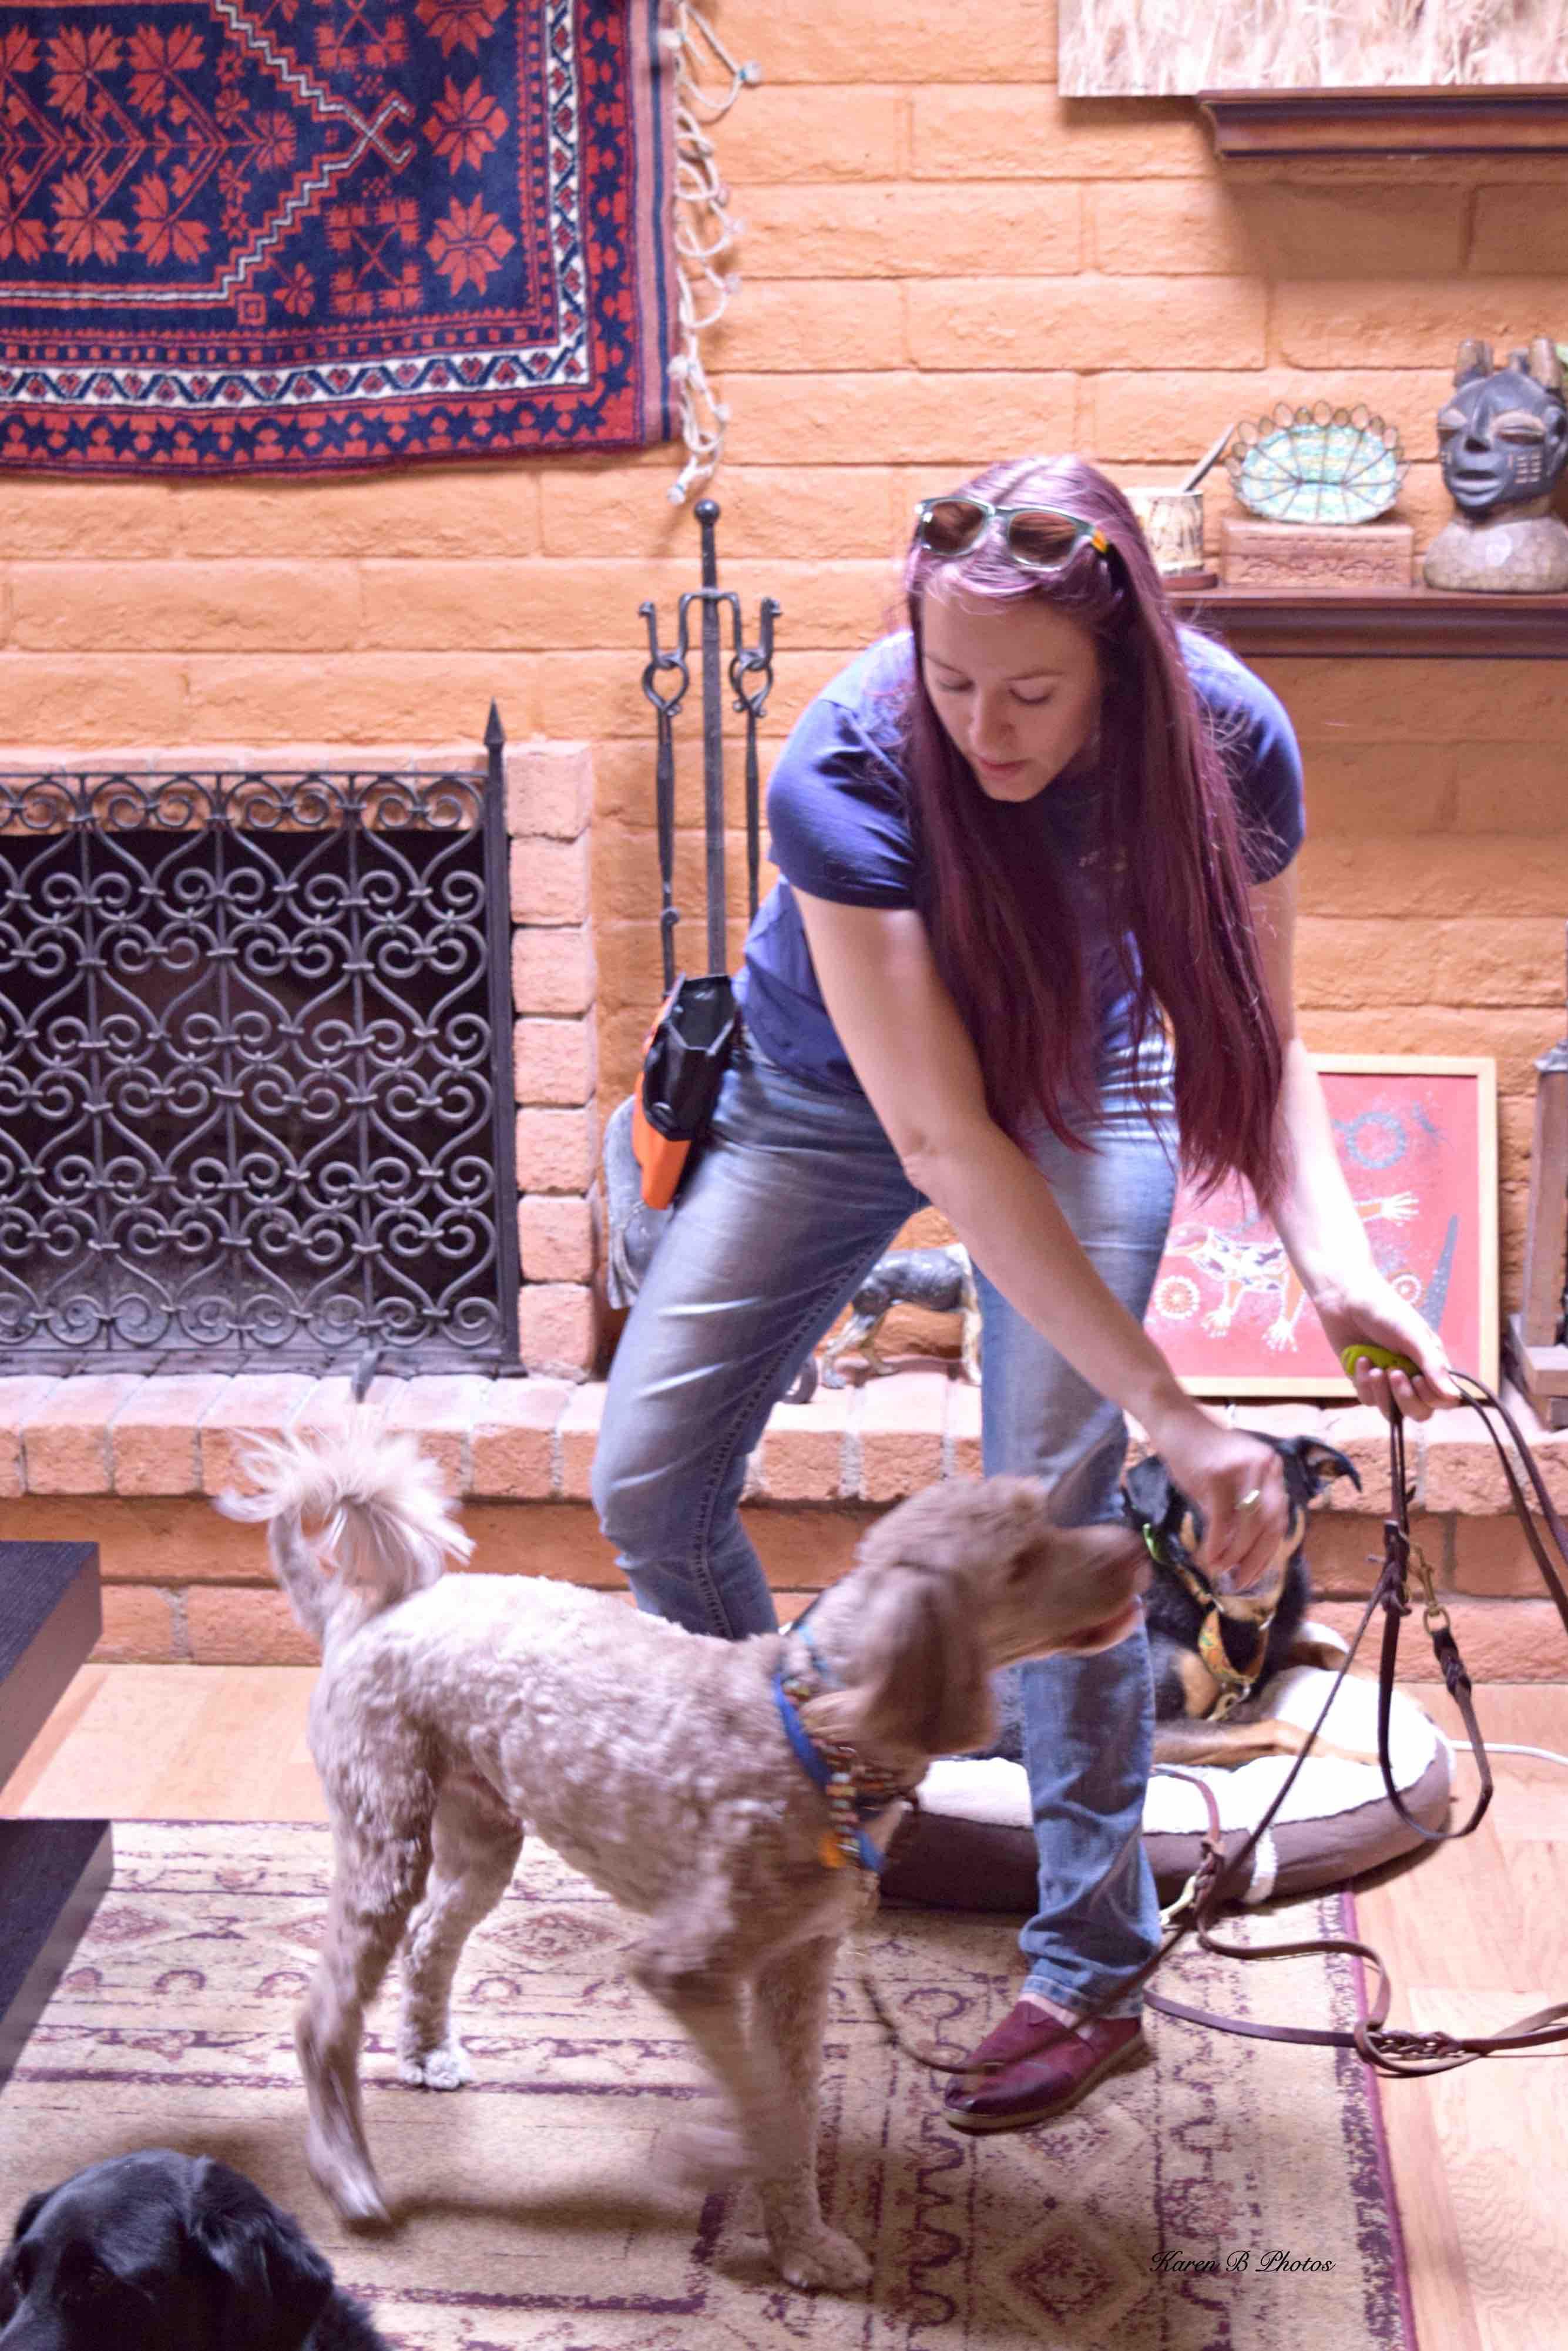 service dog workshop, jessa parker, az dog smart, dog trainer academy